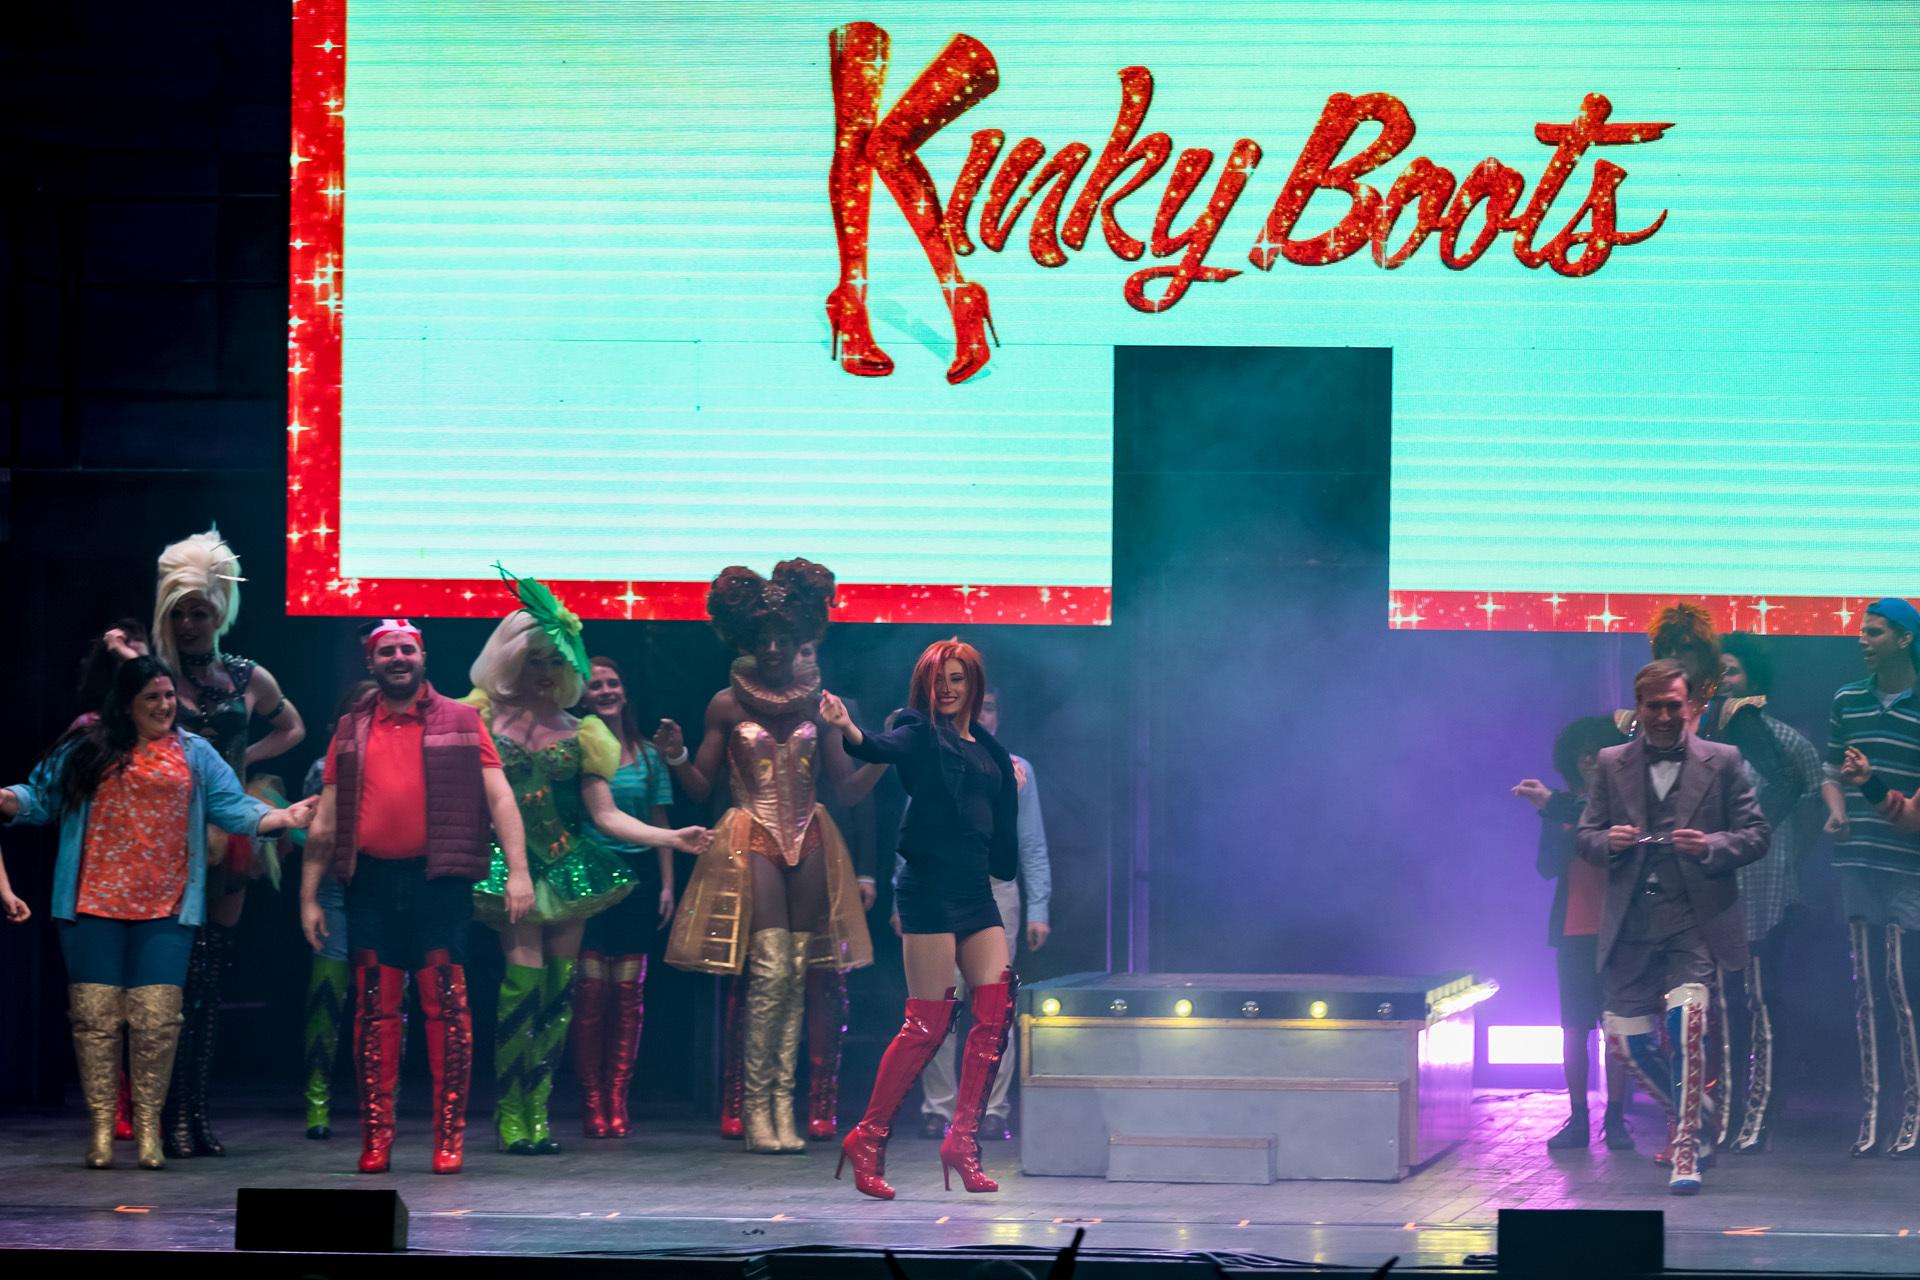 2018_11_30-©-LKV-Kinky-Boots-233321-5D4A5775